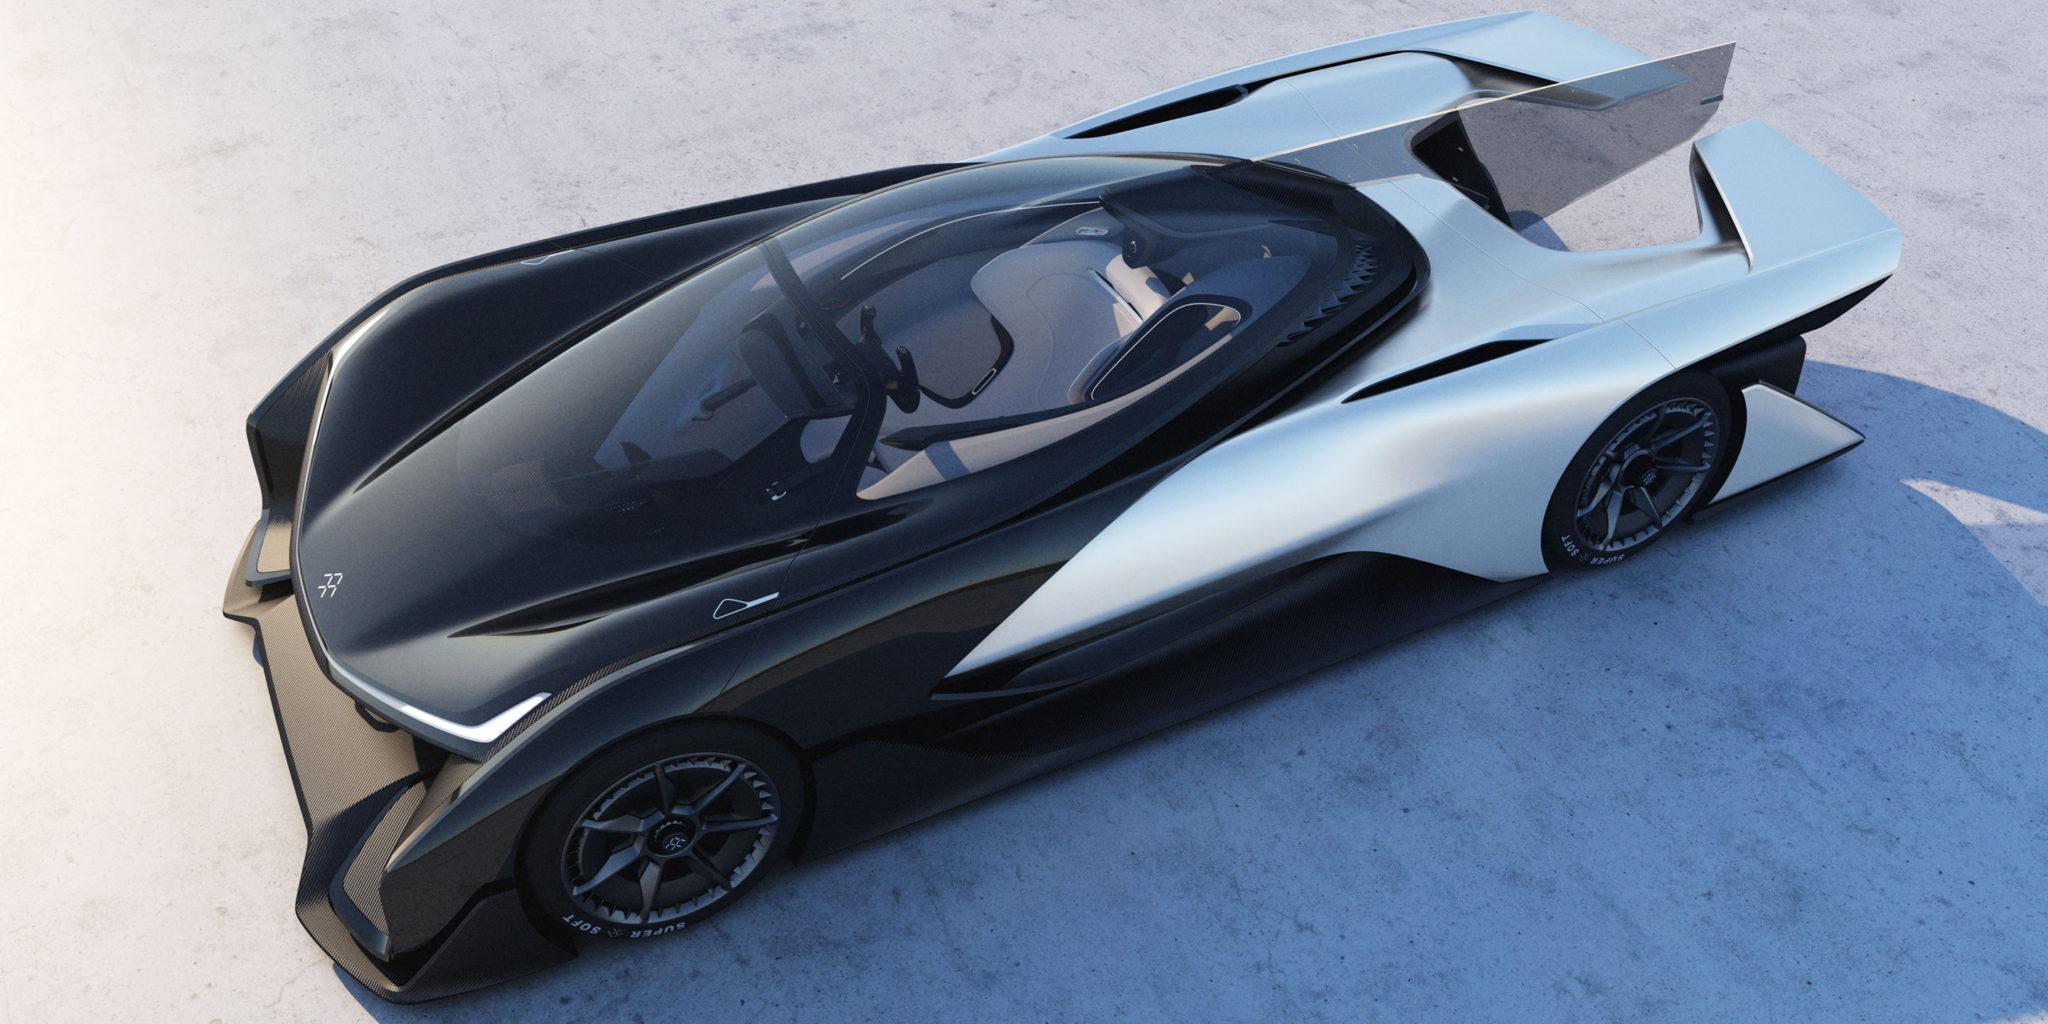 Faraday Future's 1000HP electric car